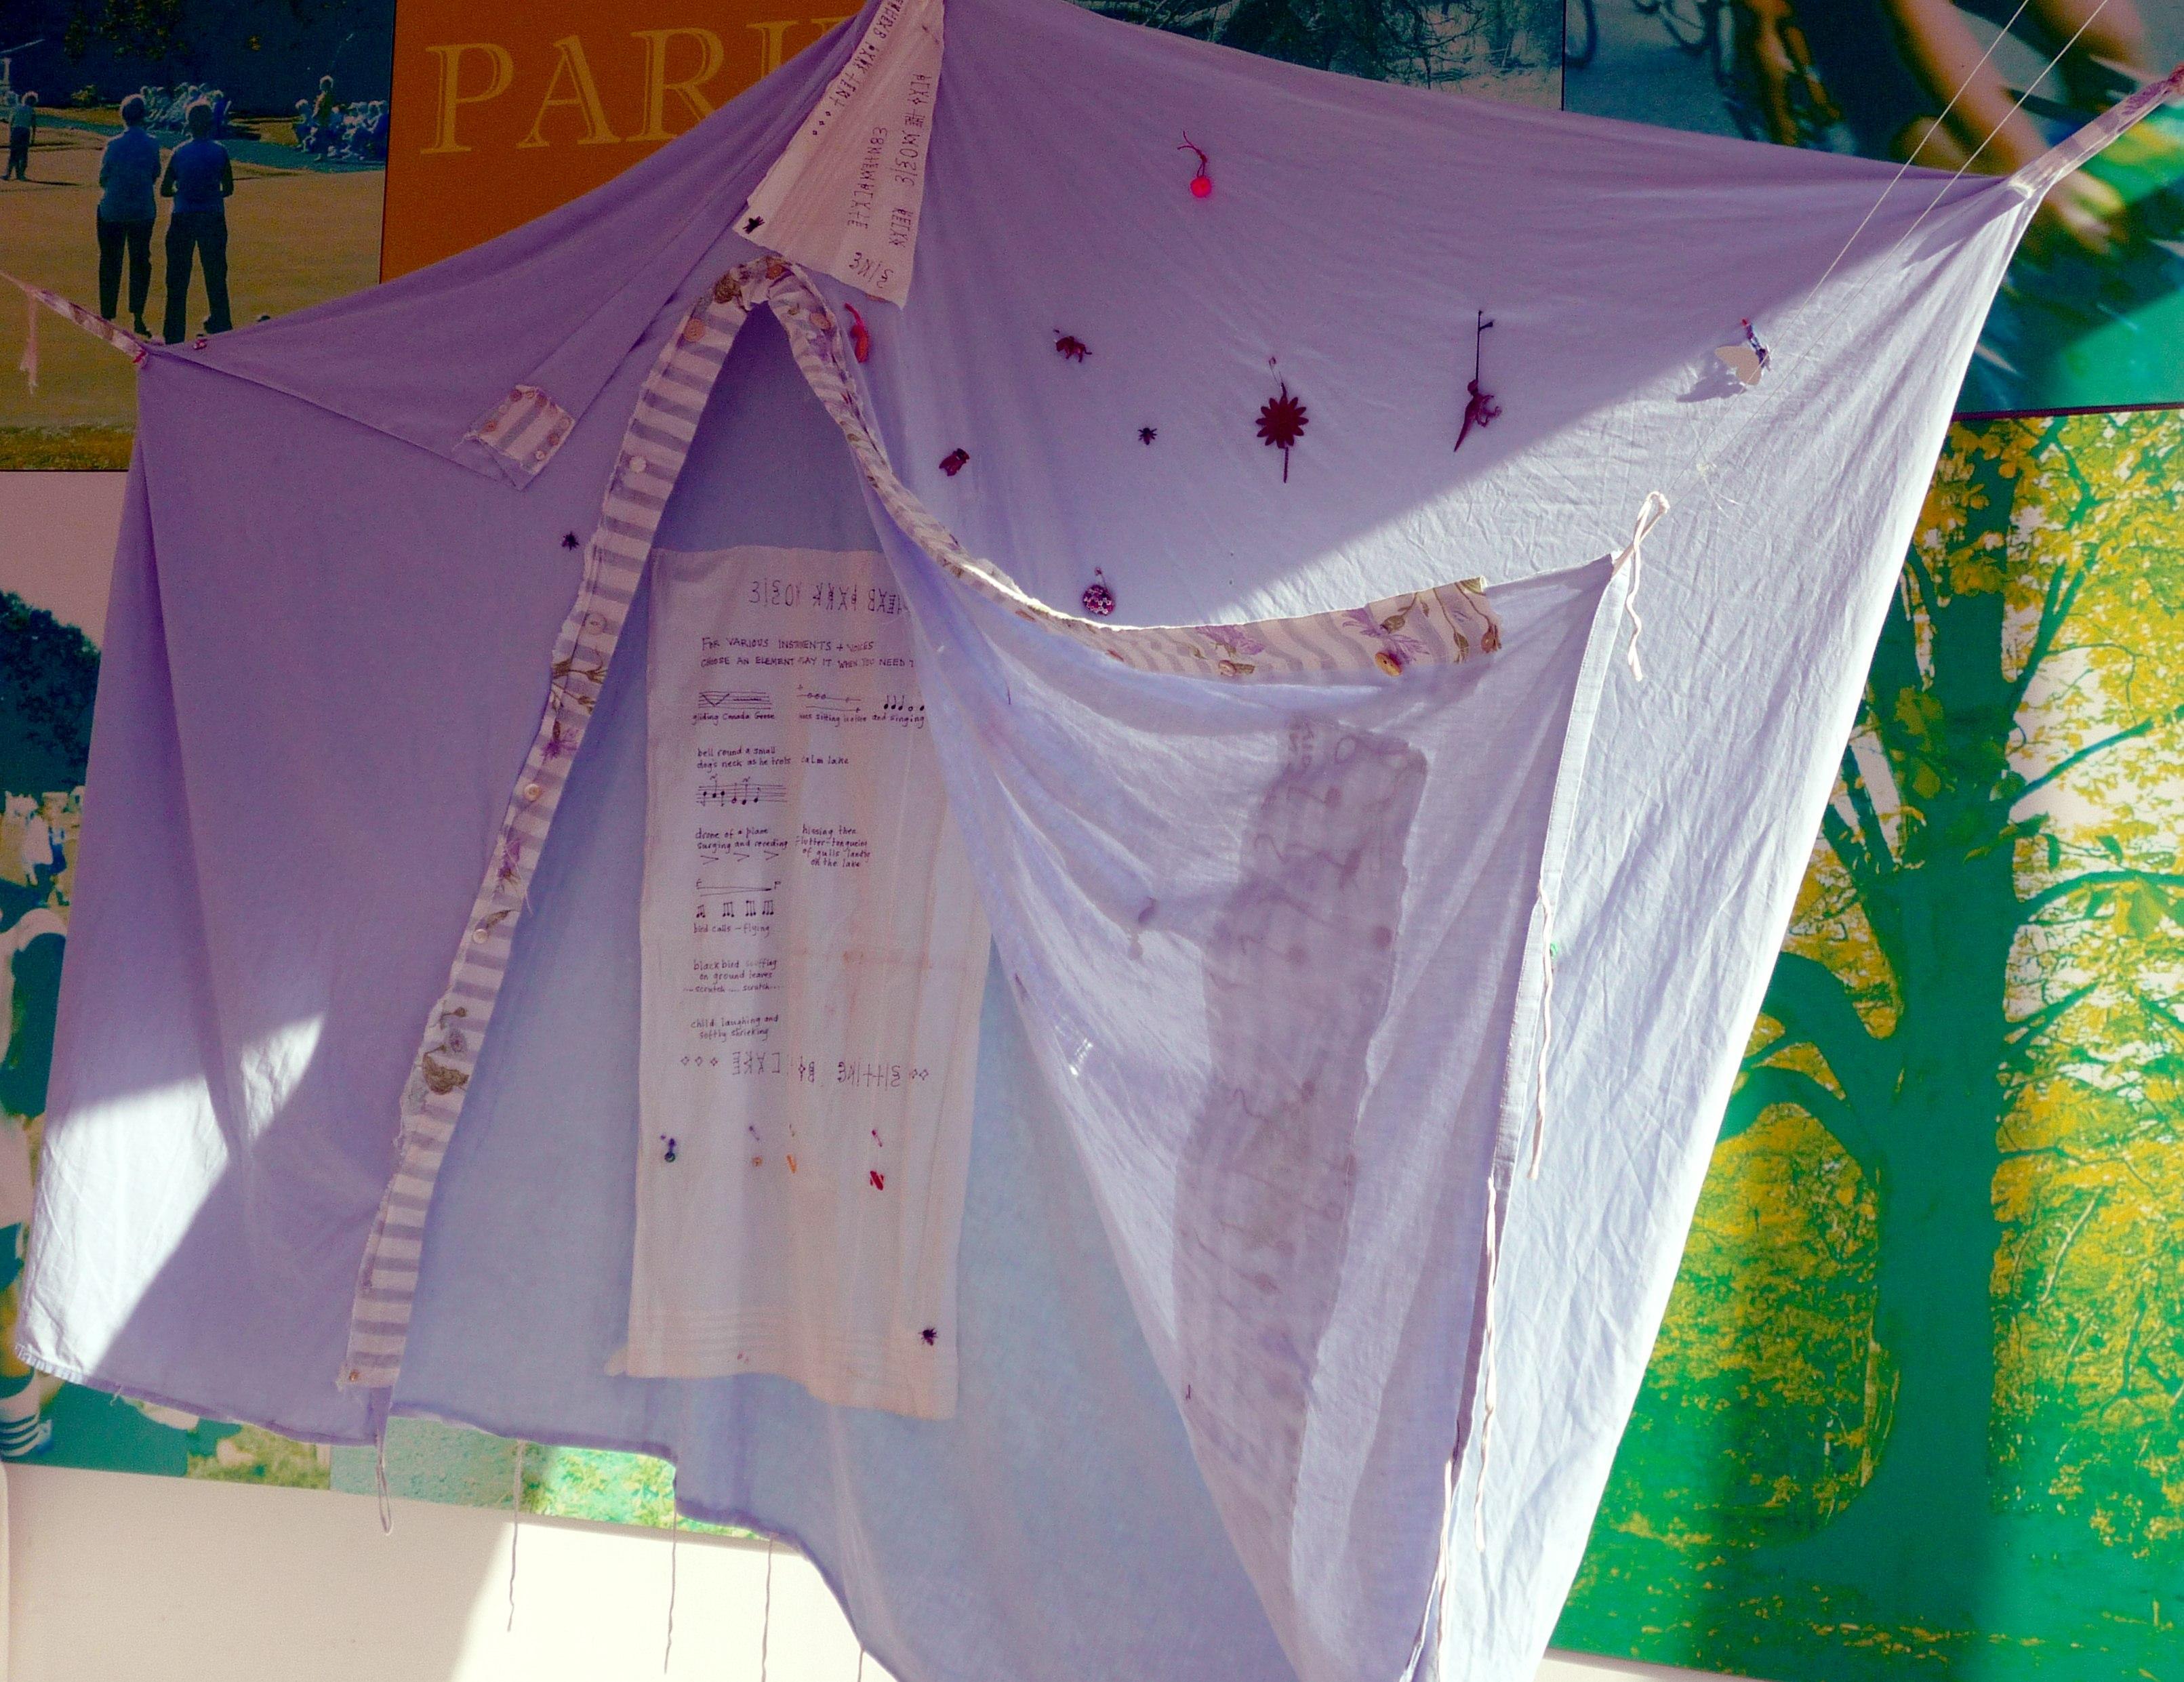 TRAVELLING TENT by Judith Railton, recylced fabrics